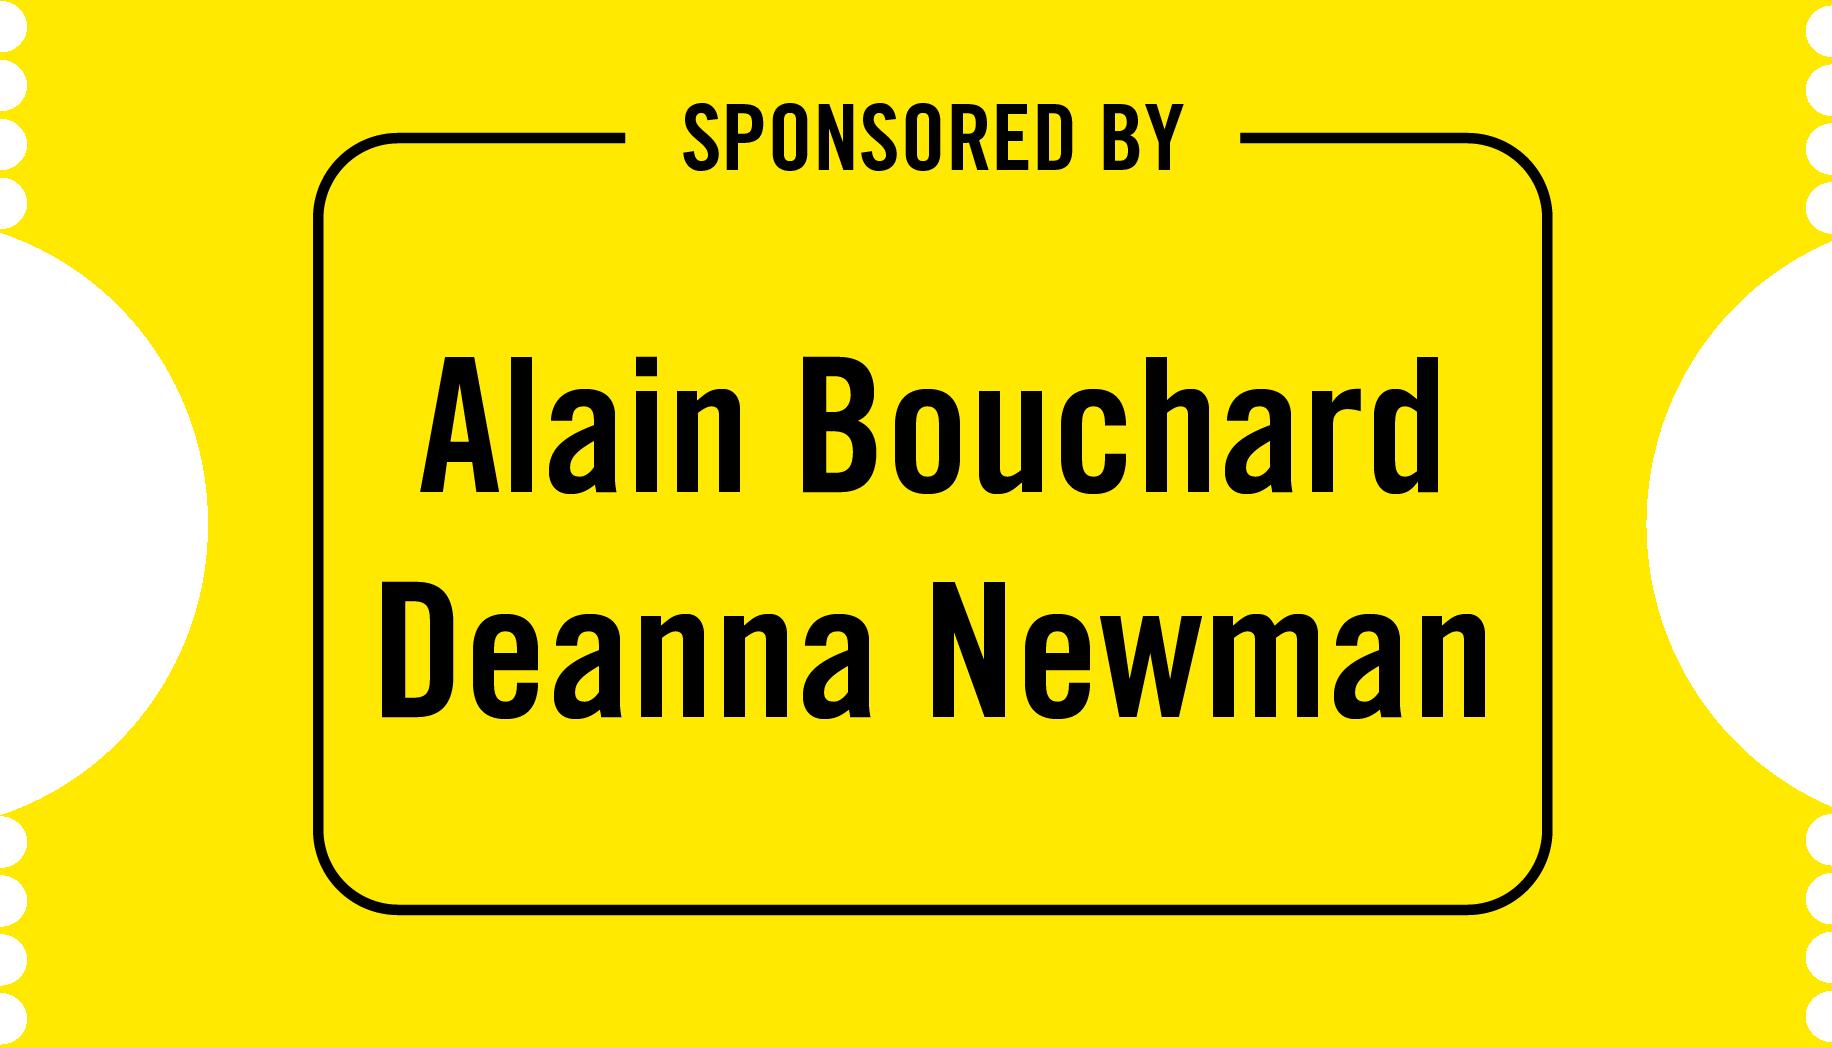 Alain Bouchard & Deanna Newman